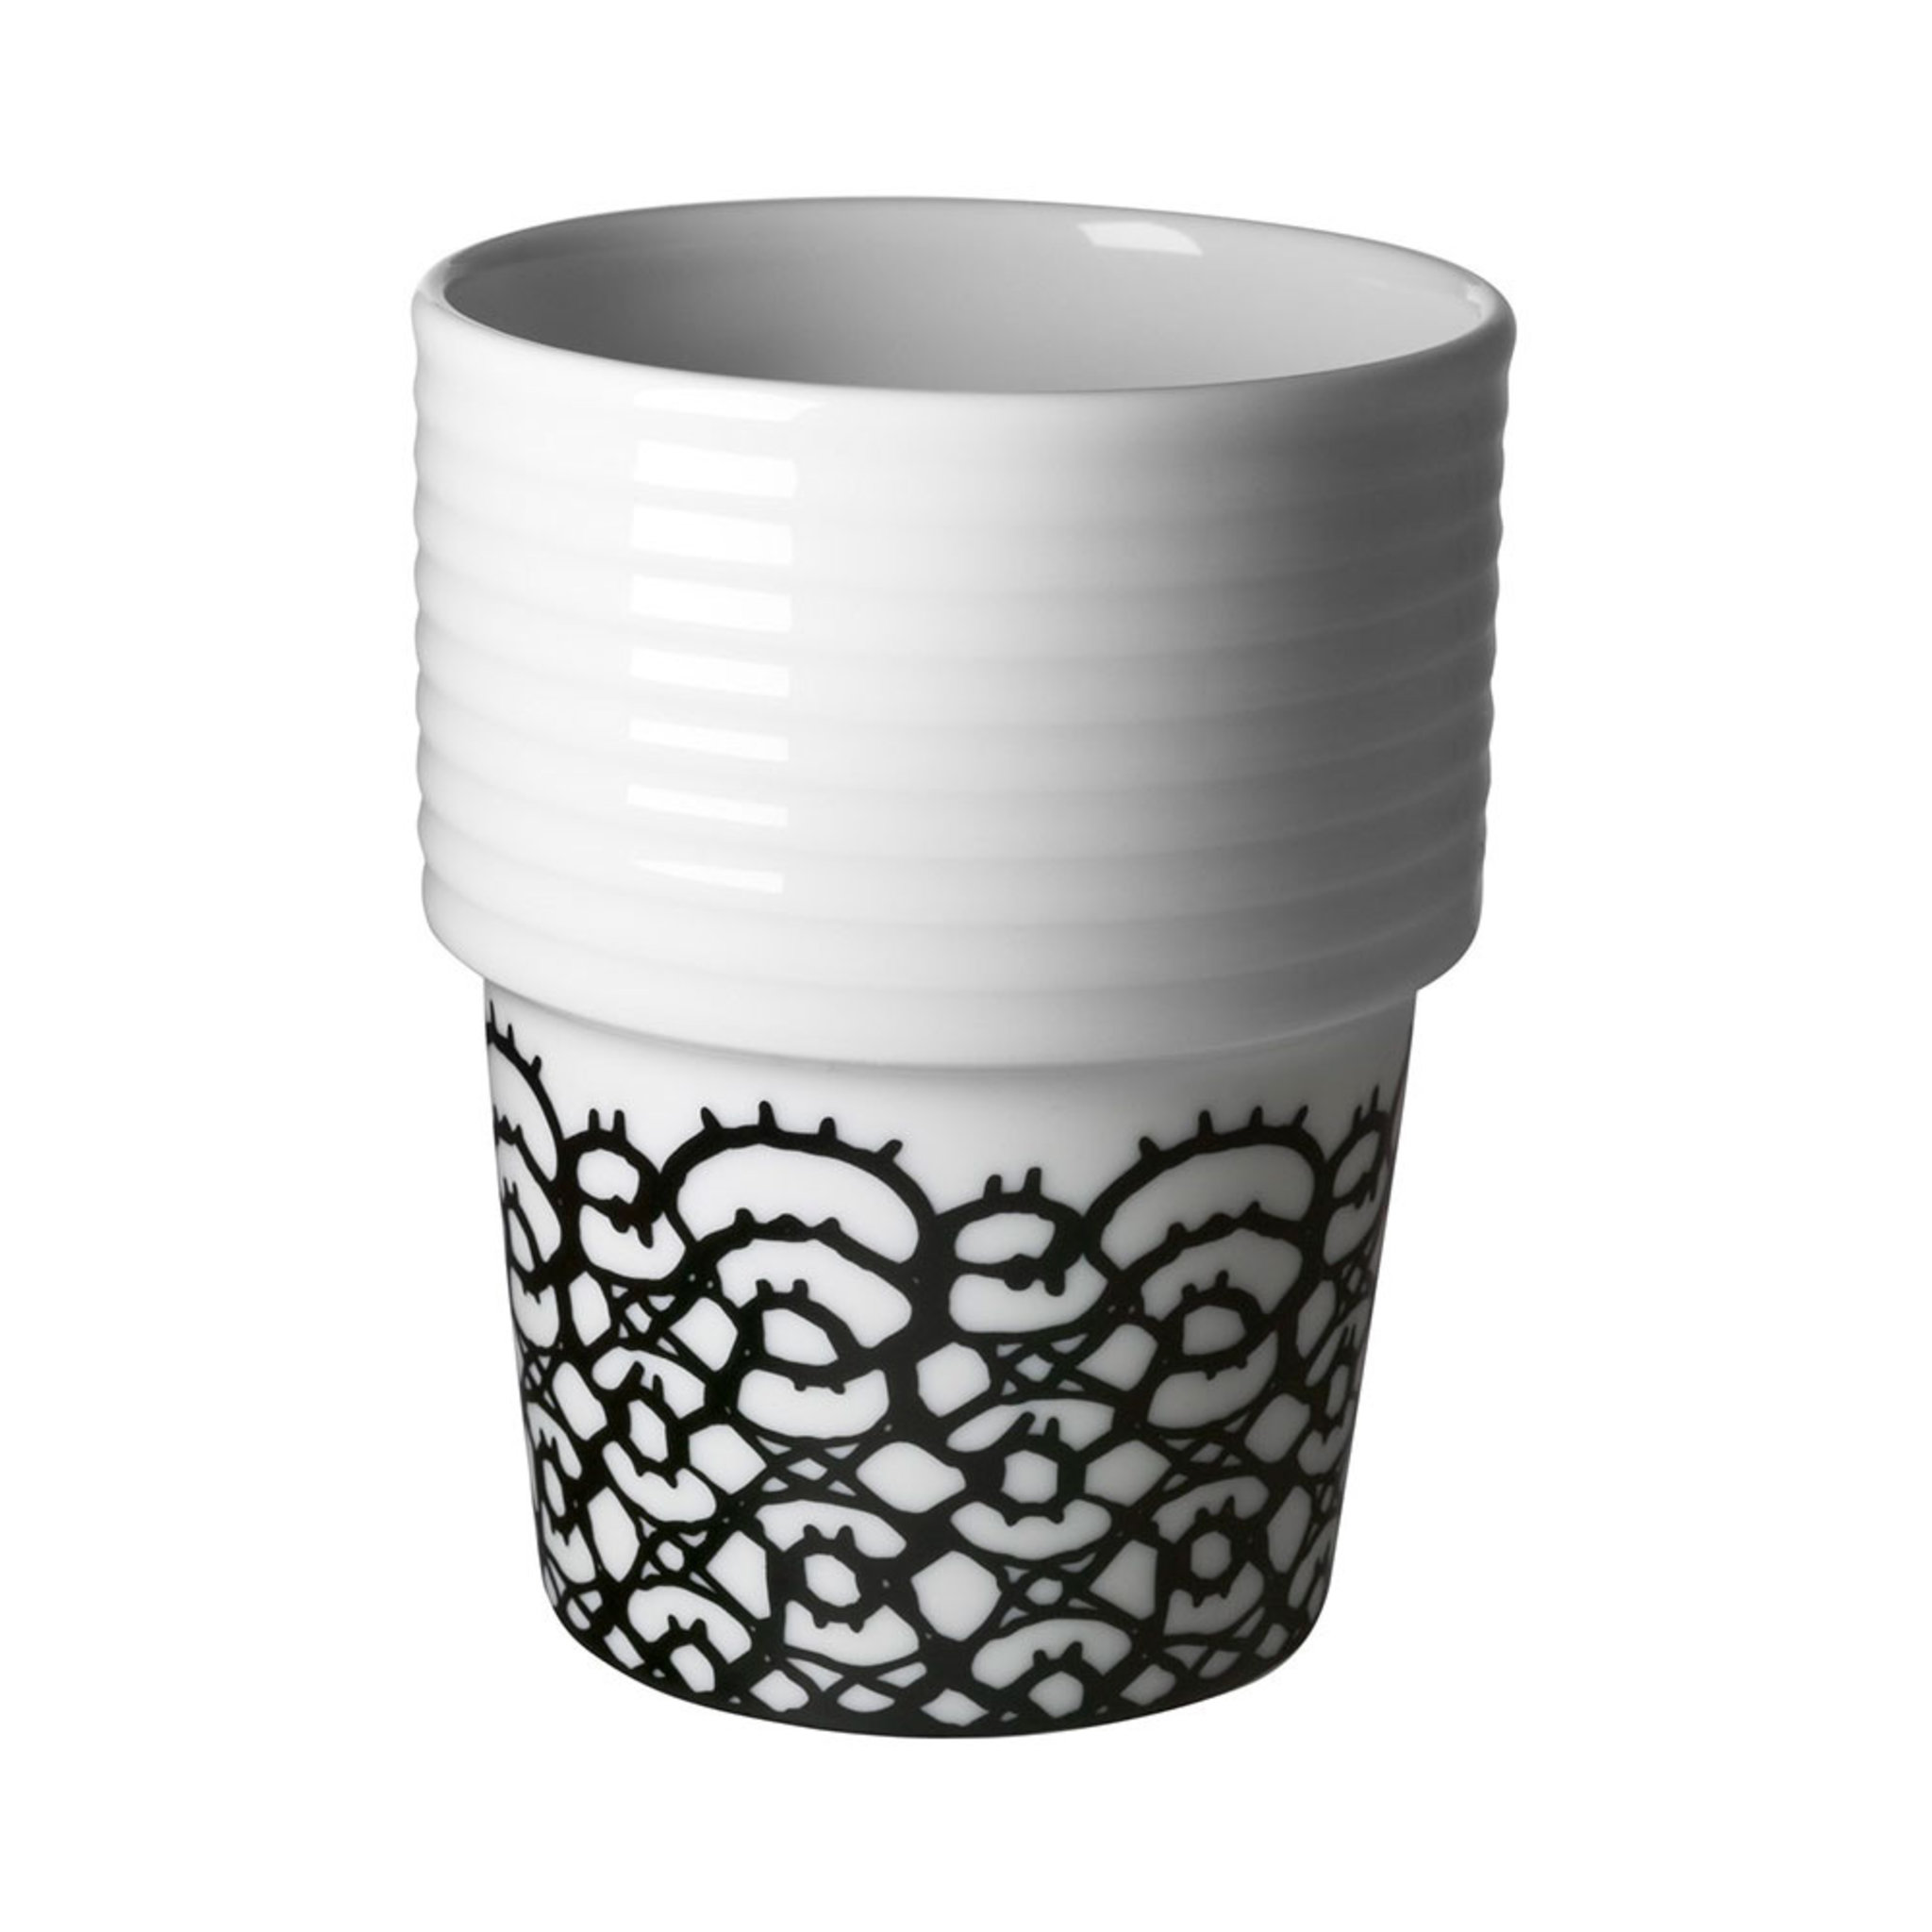 ec0bd1f42eb7 kaffemugg, filippa K 2-pack, 31 cl - Muggar & koppar - Köp online på  åhlens.se!